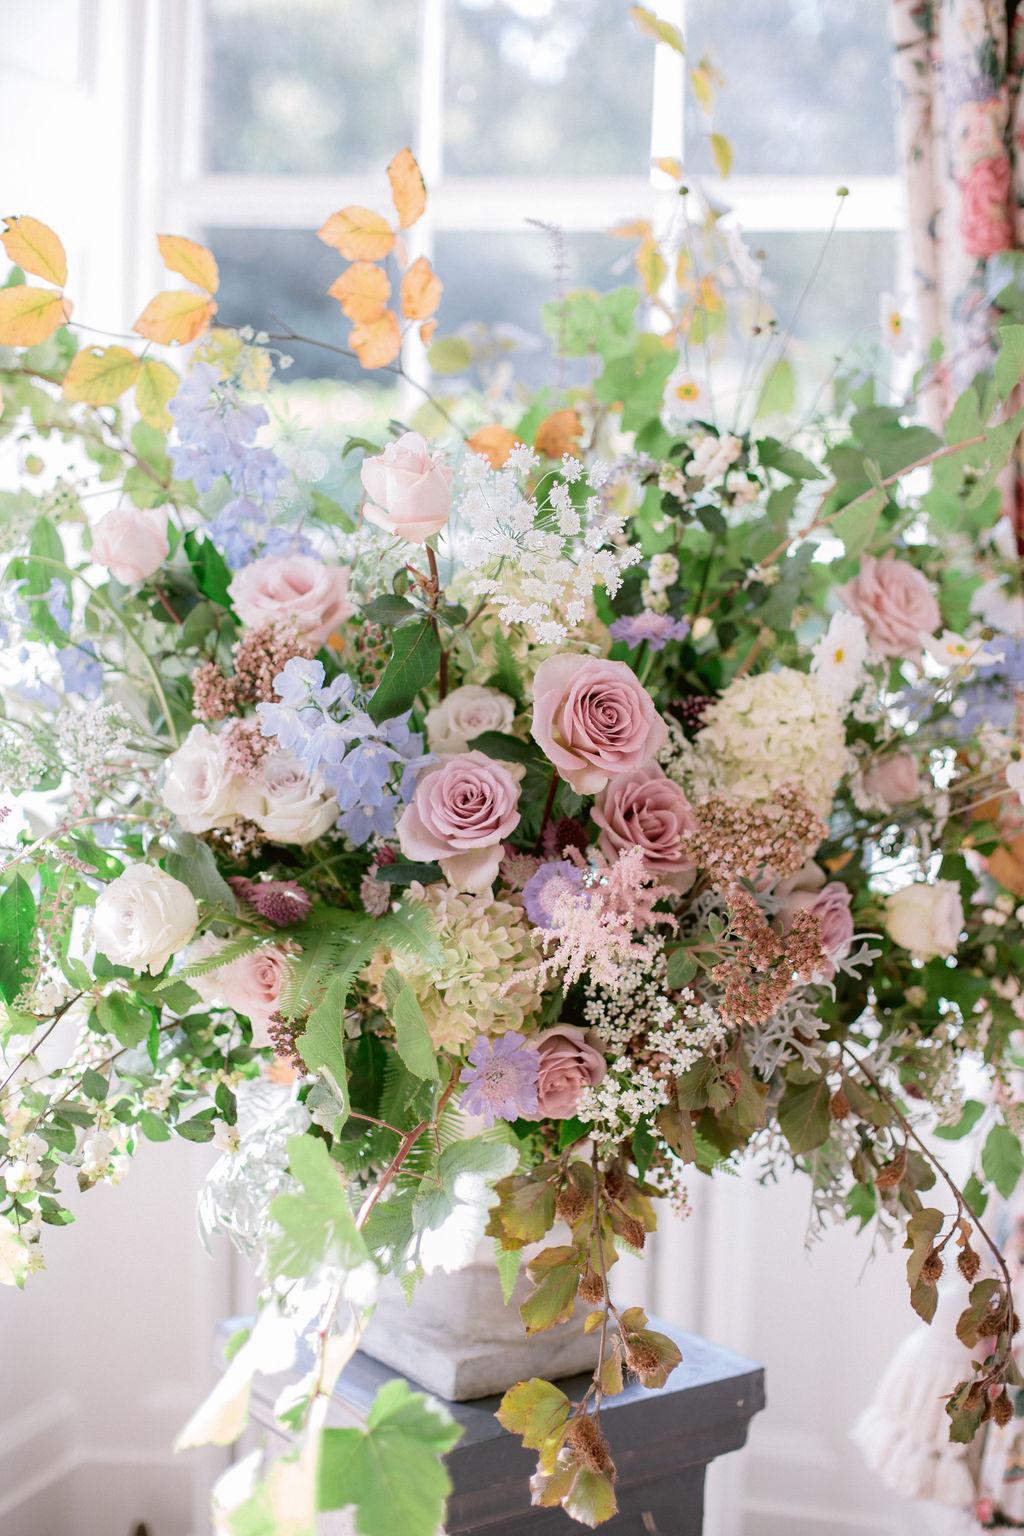 Narcissus Flowers Wedding Florist - Gilmerton House Wedding Photographer